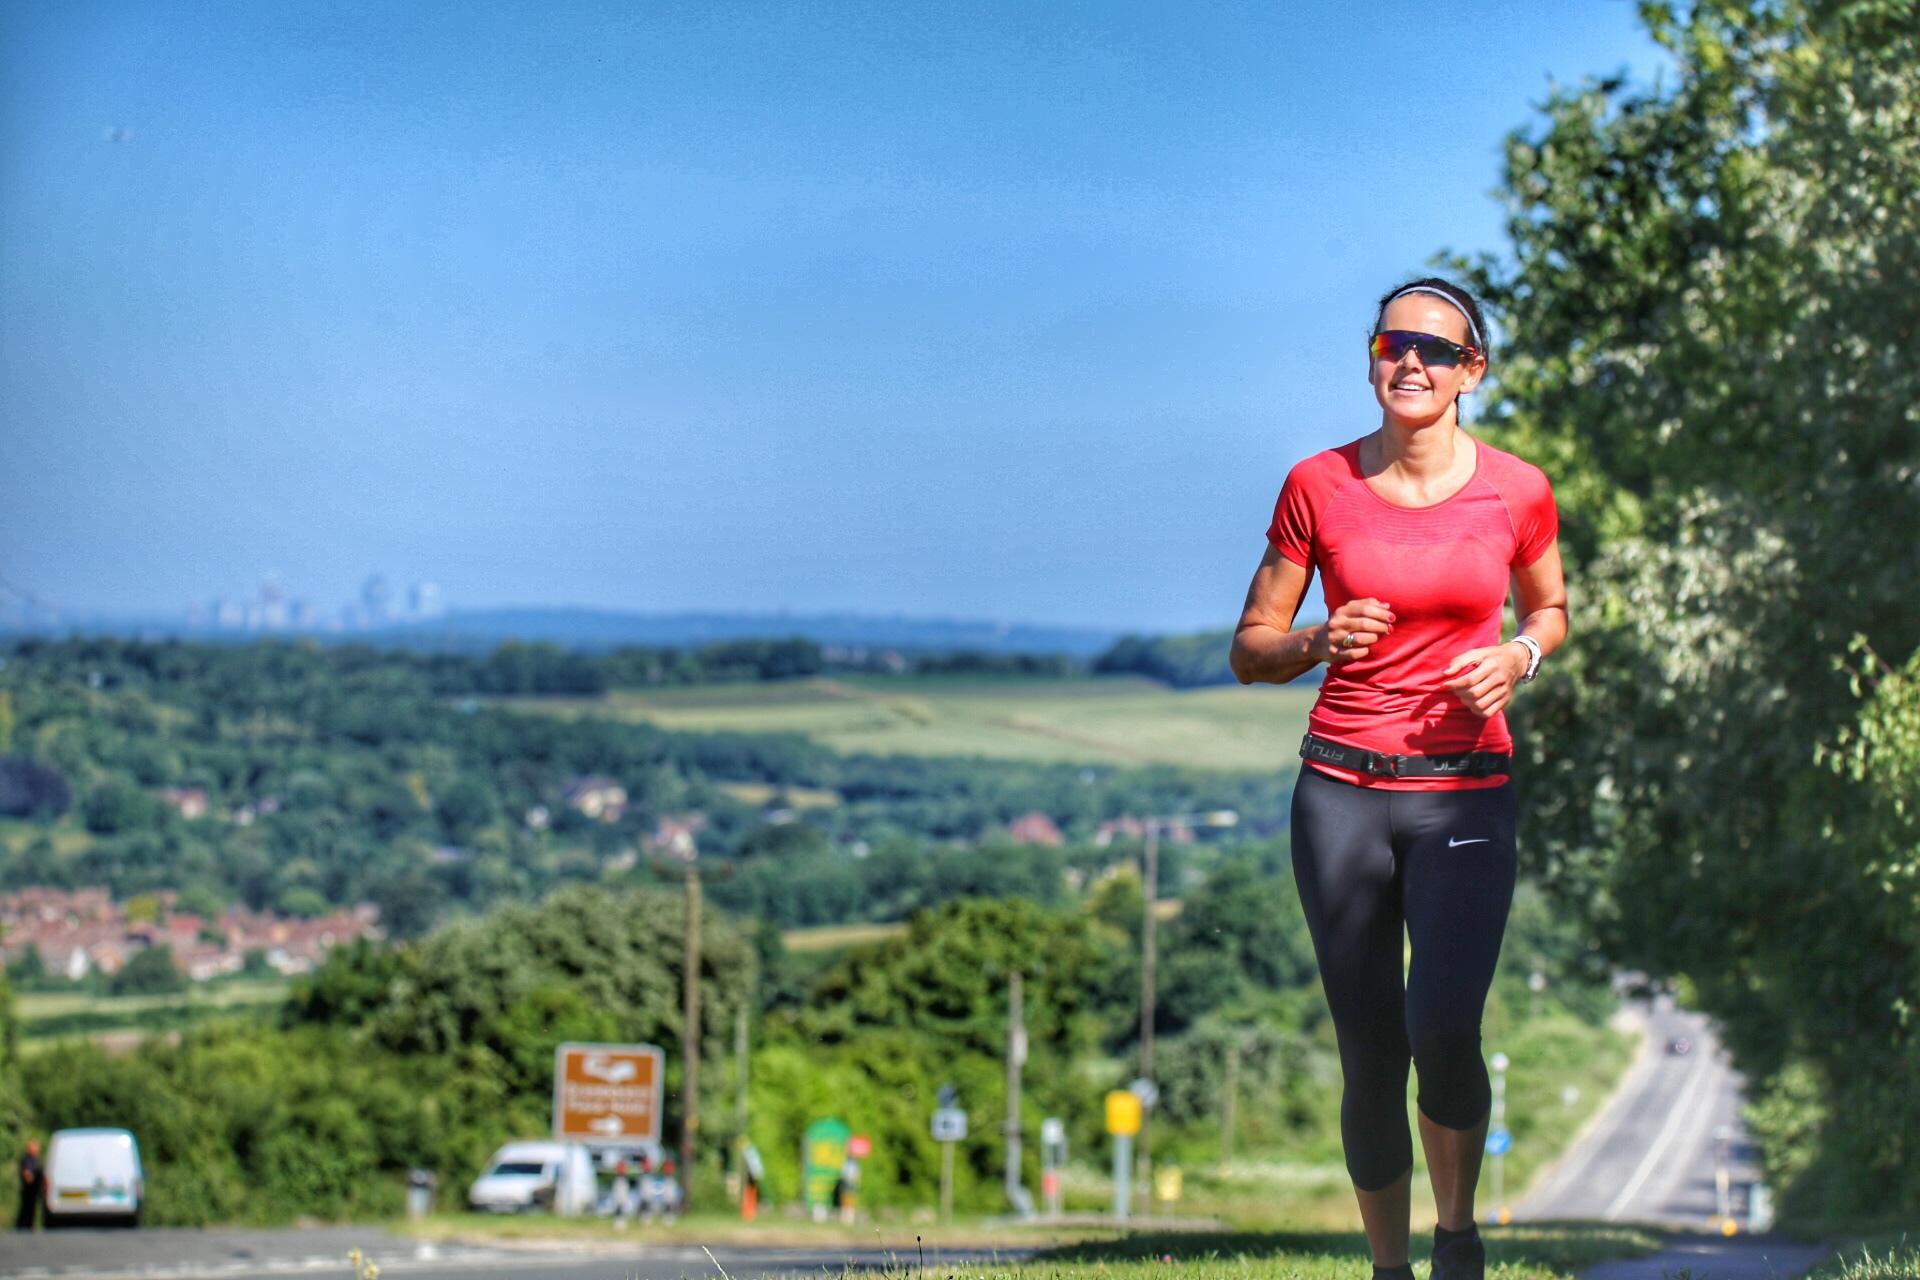 Perrine summitting a hill outside London